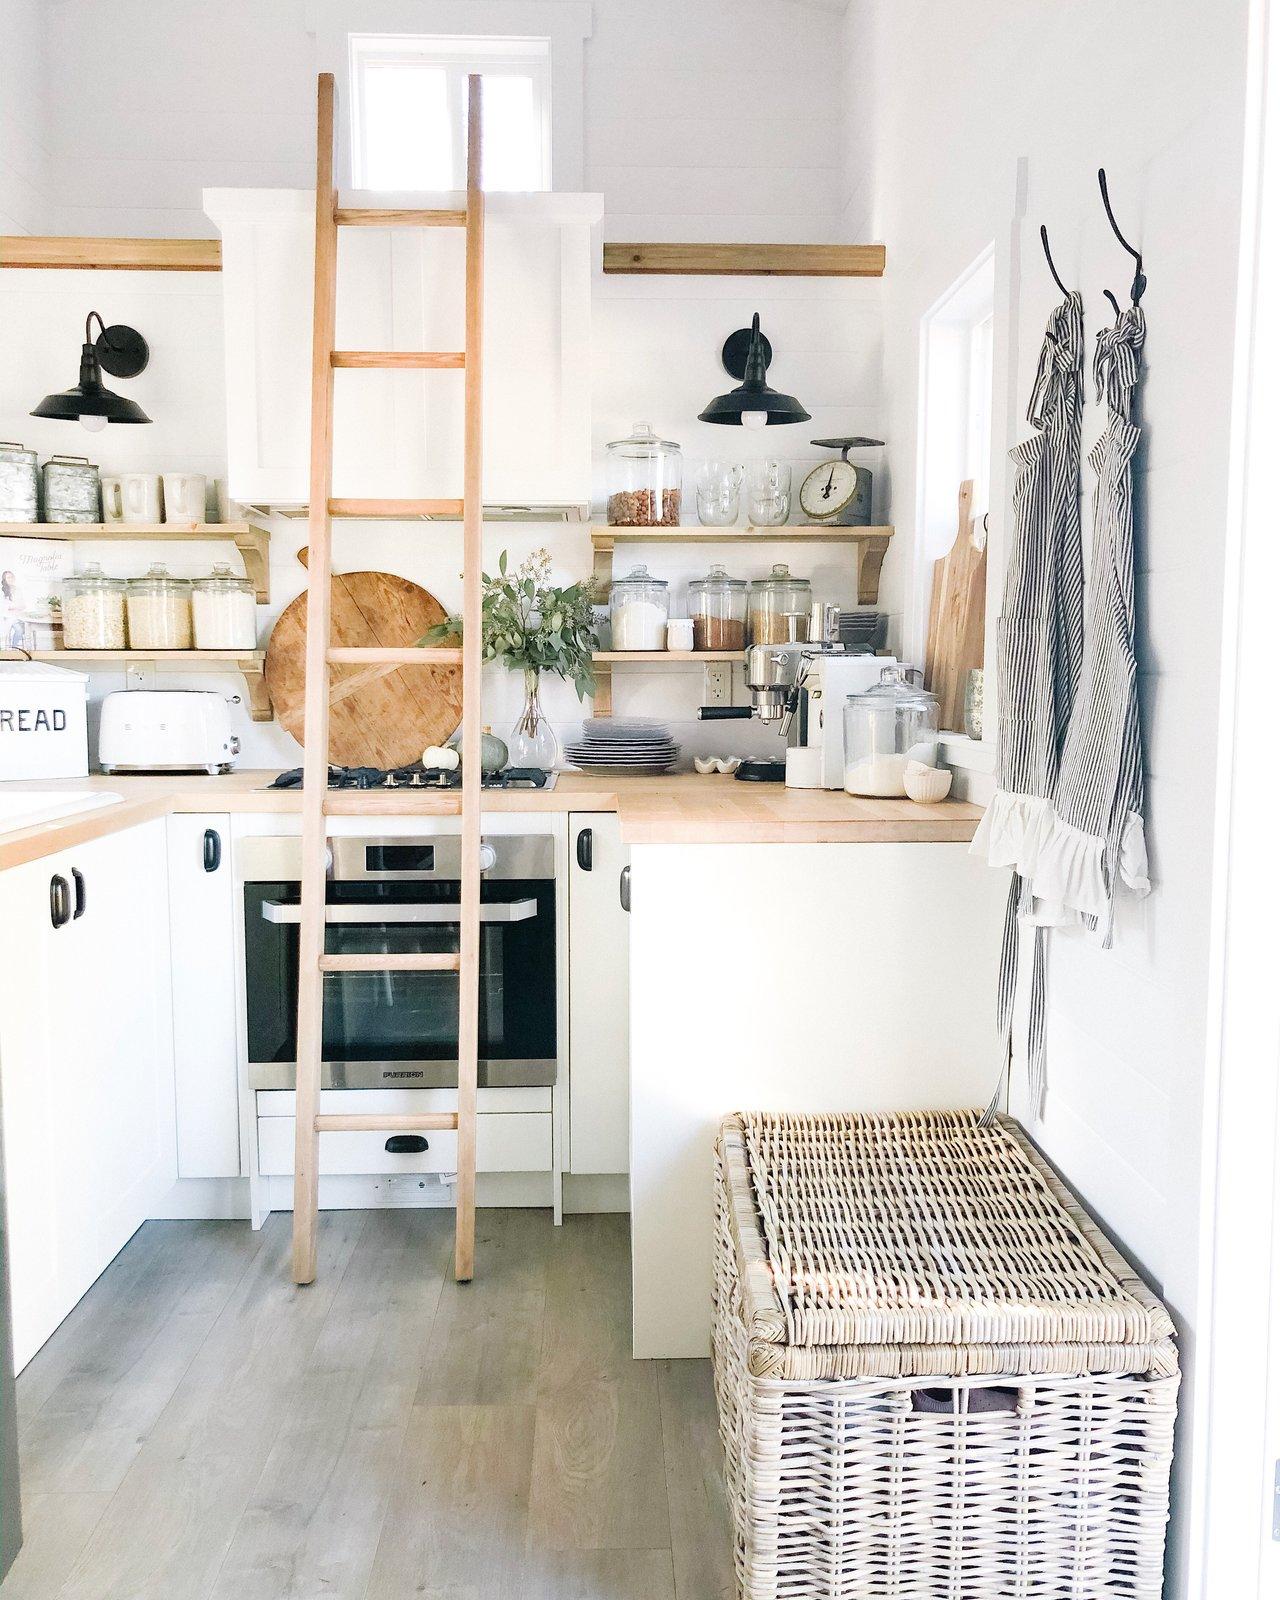 White Country Tiny House kitchen